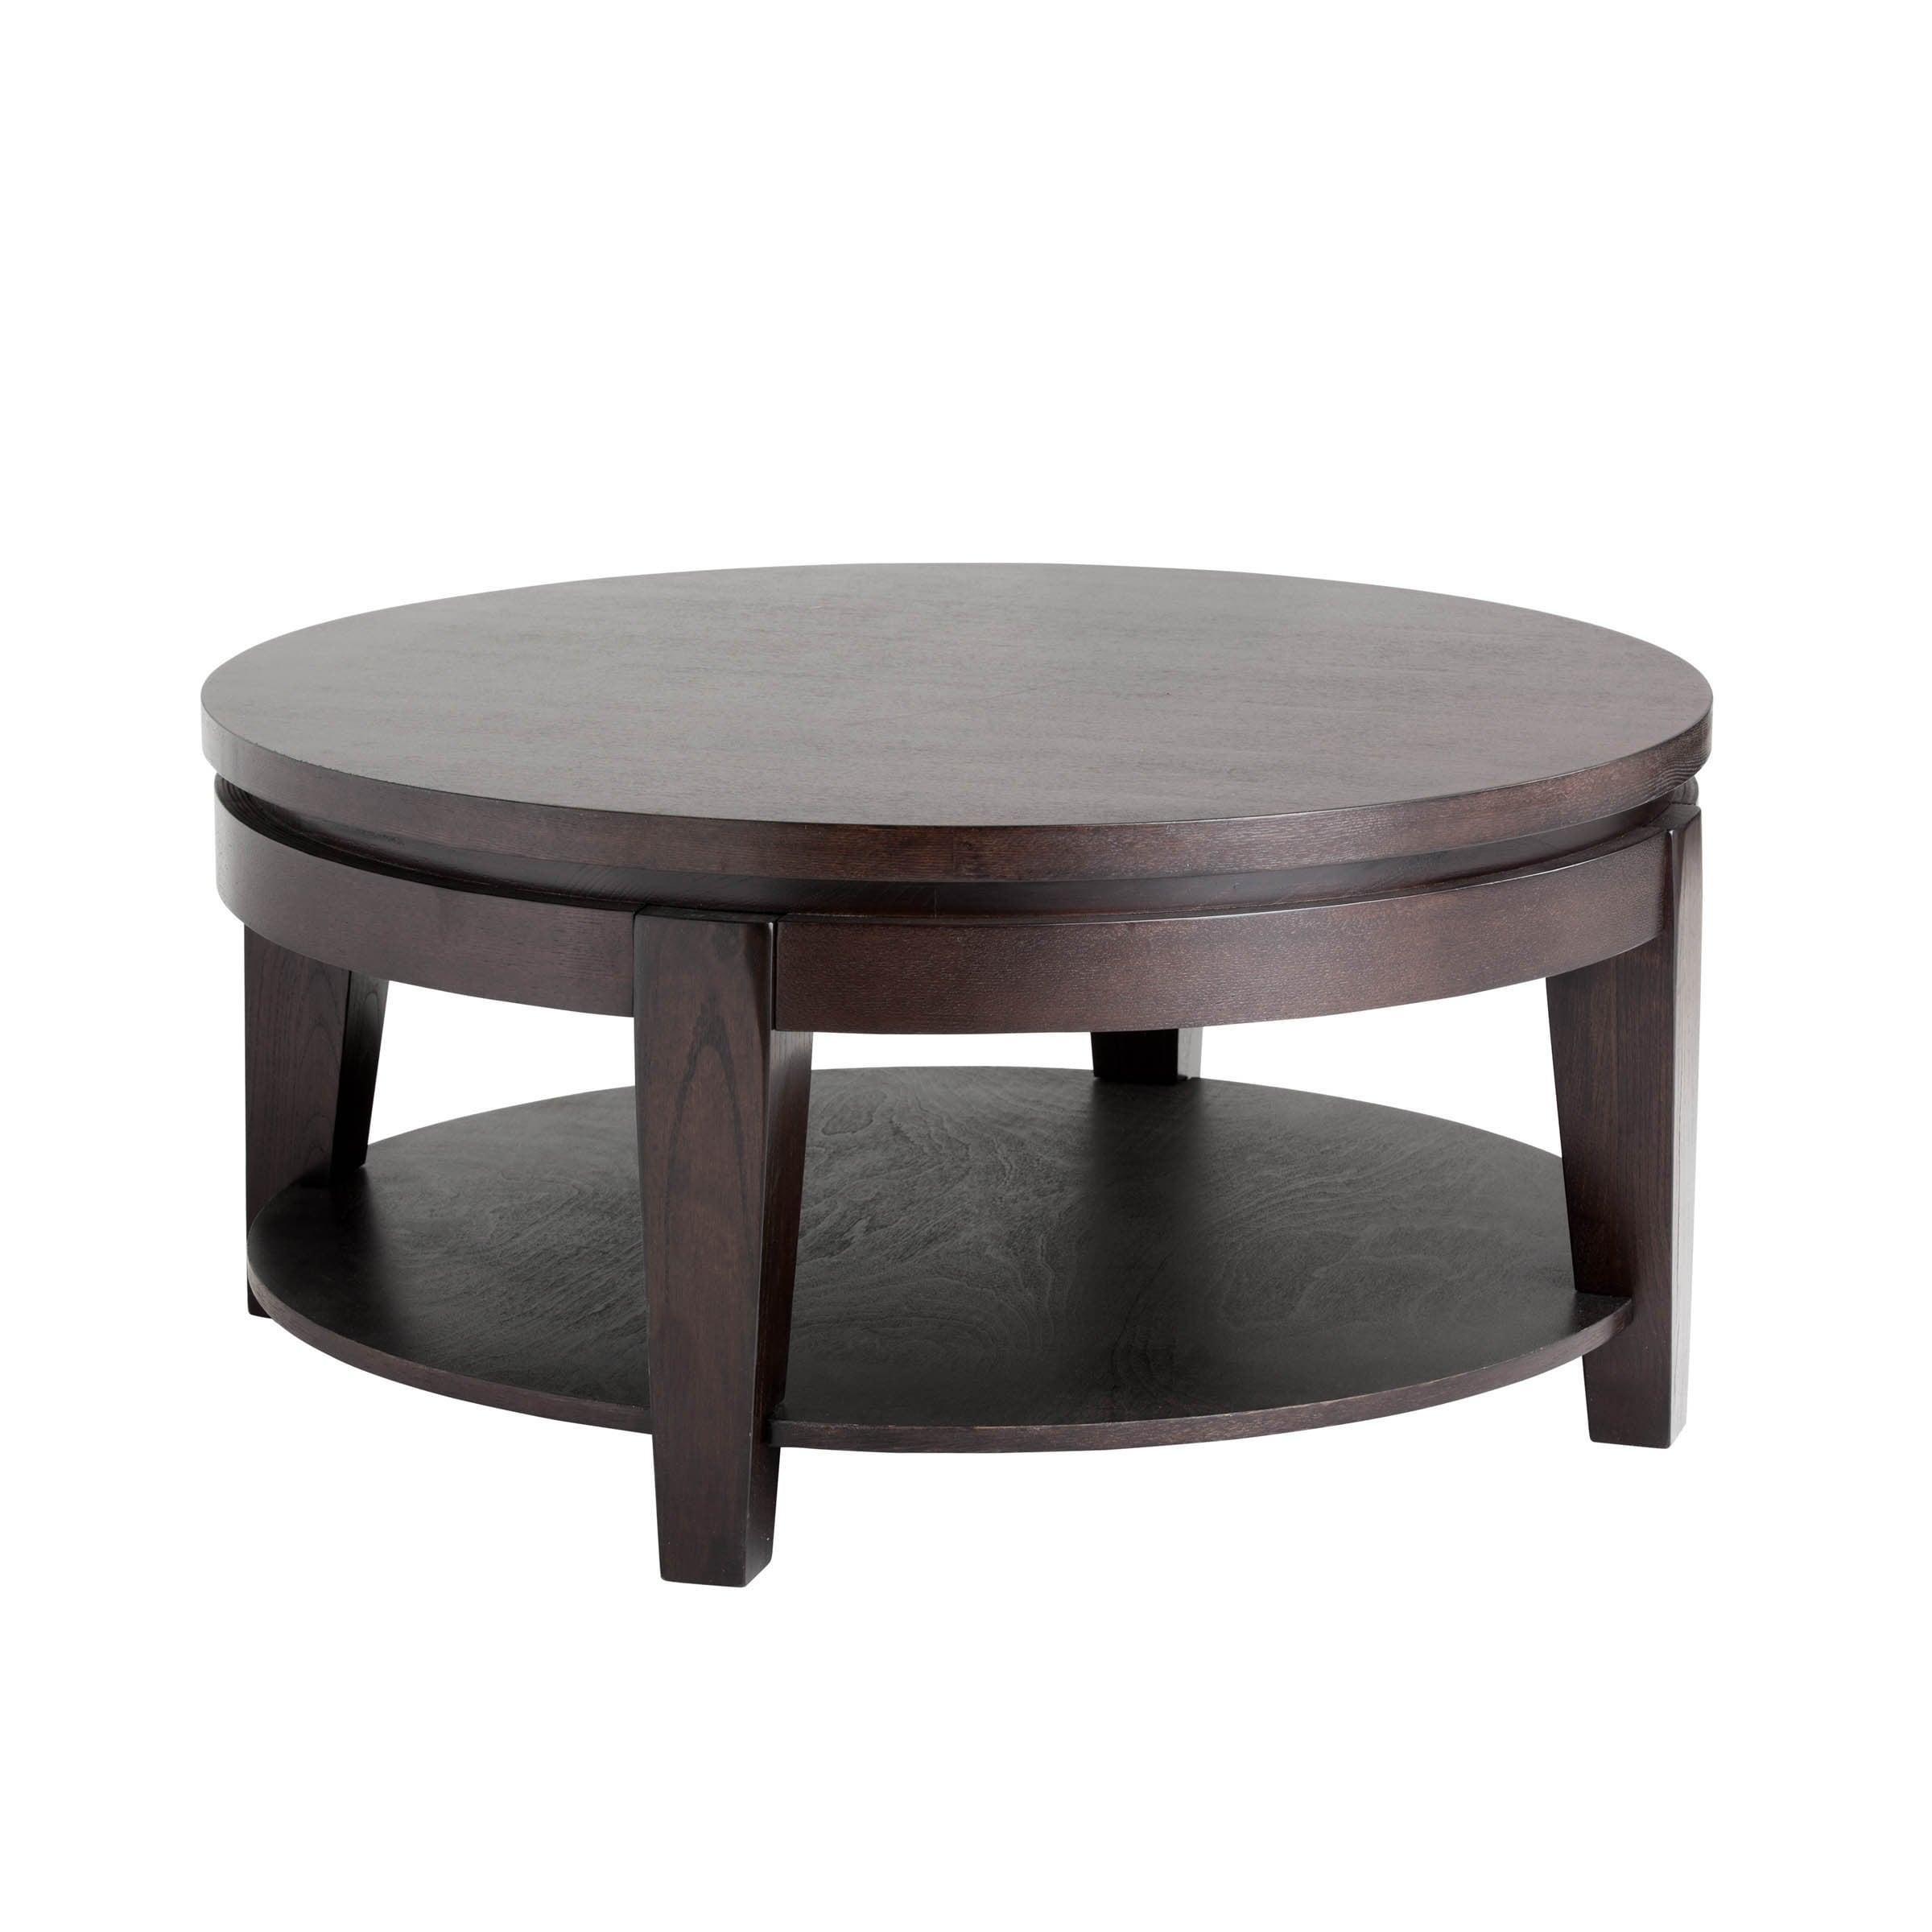 Shop Sunpan U0027Ikonu0027 Asia Espresso Round Coffee Table With Shelf   Free  Shipping Today   Overstock.com   9219371